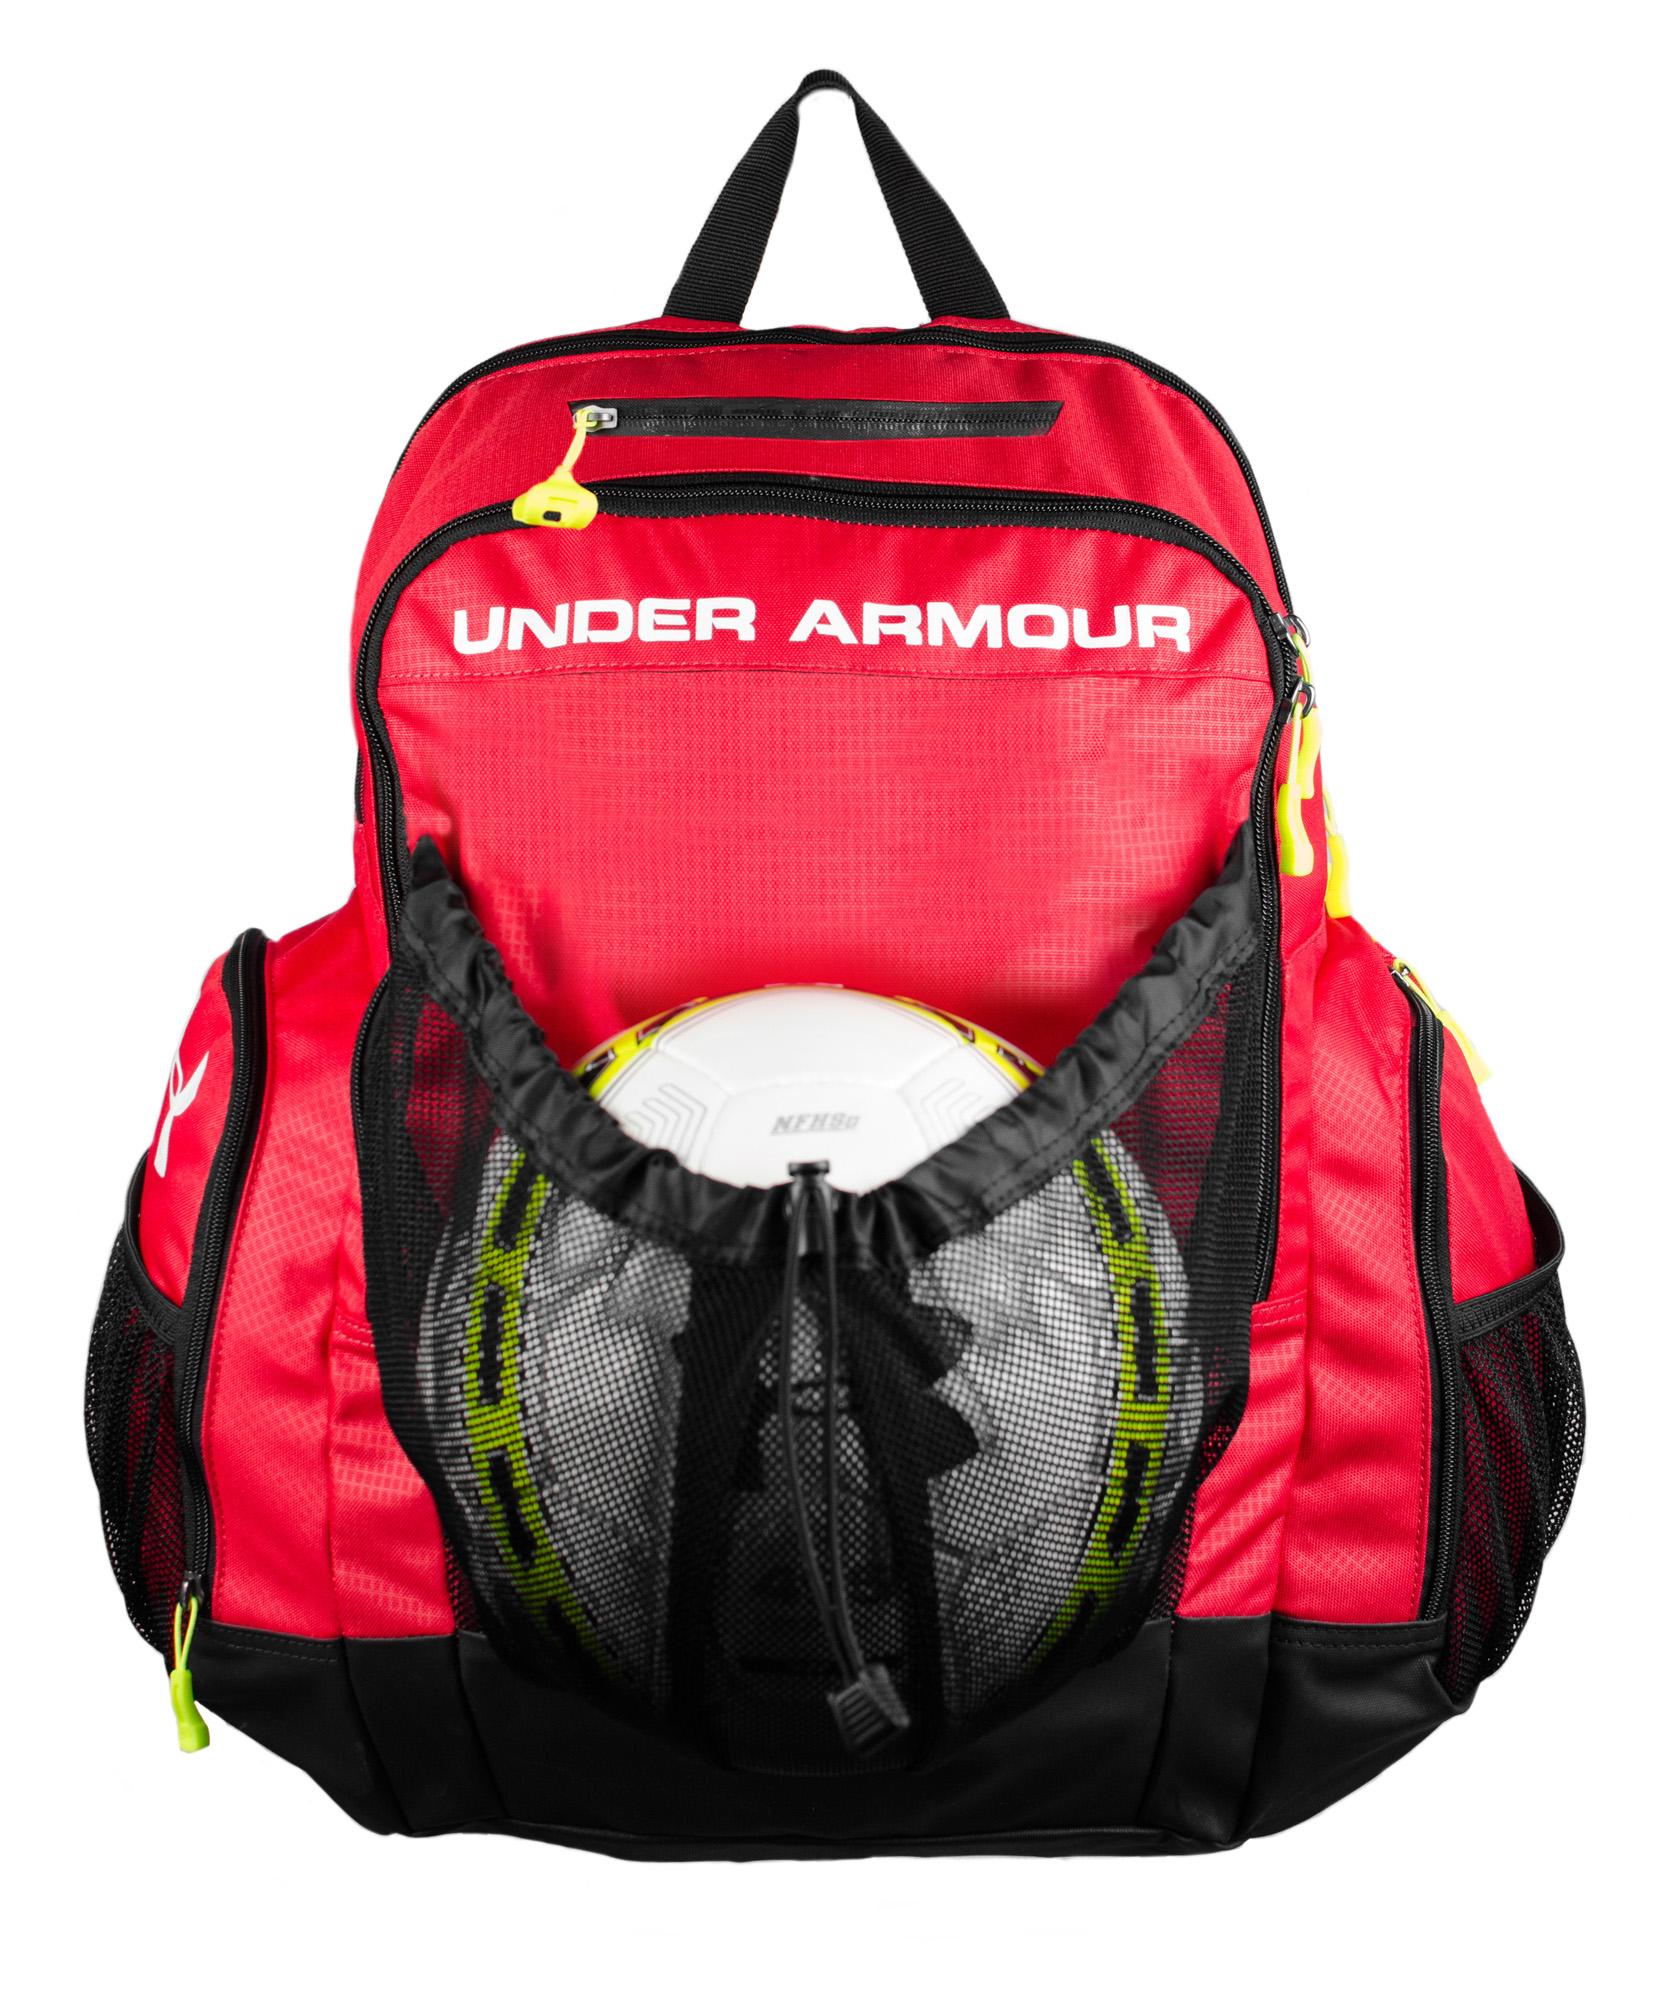 da25d29ae63 Under Armour Striker Soccer Backpack - Sieverts Sporting Goods